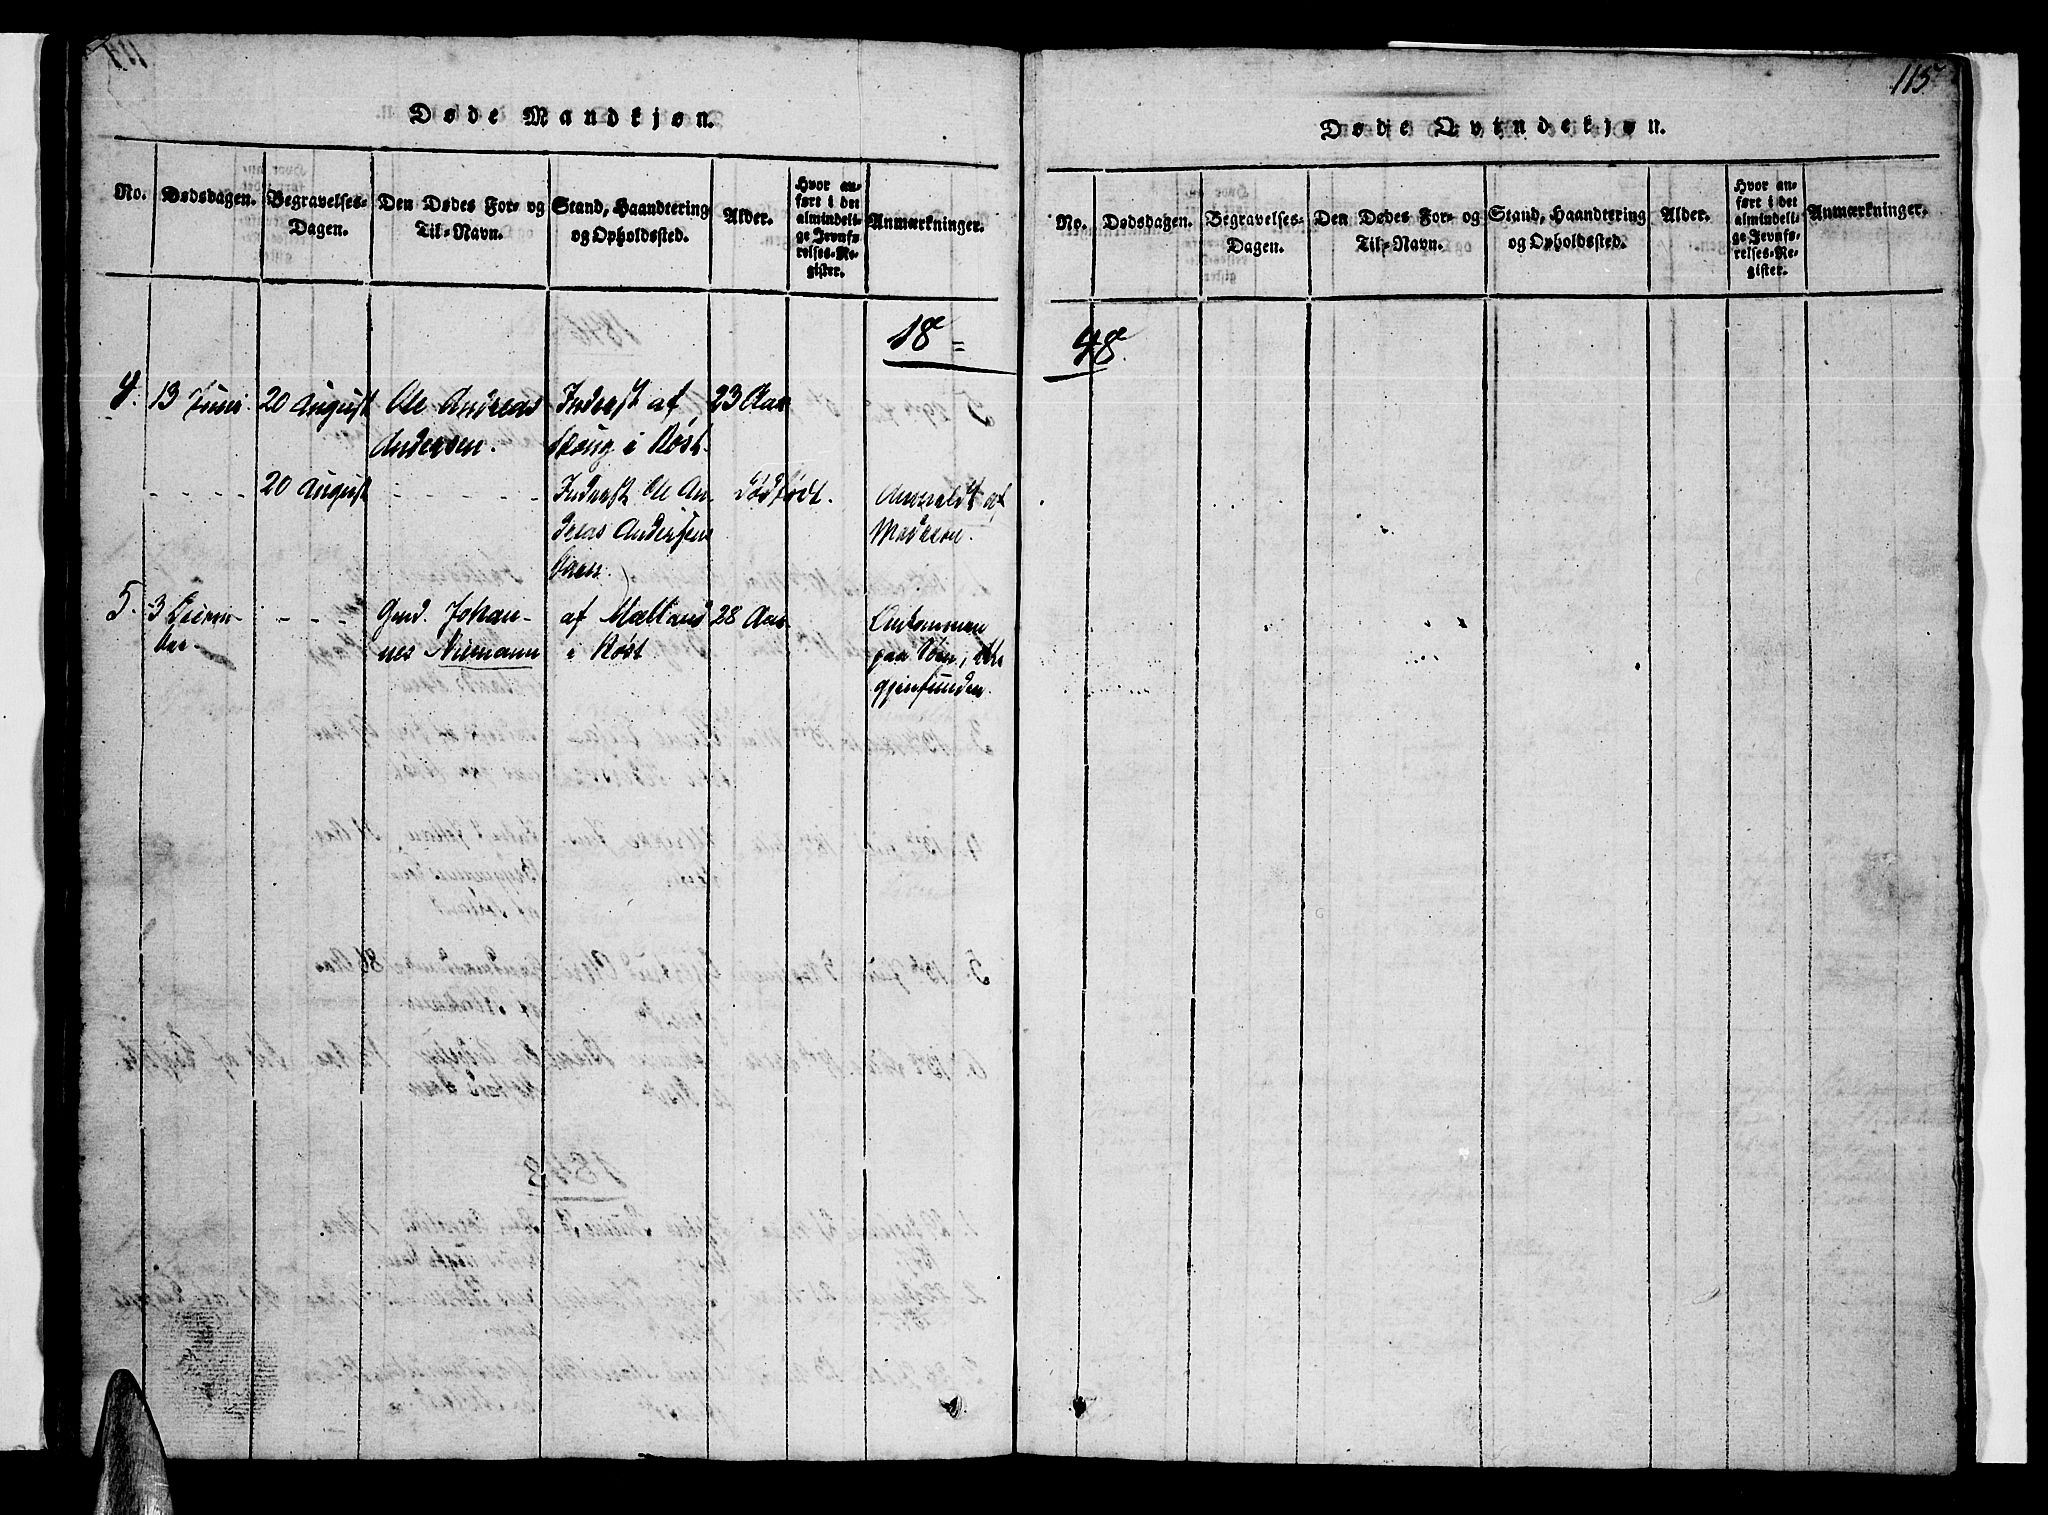 SAT, Ministerialprotokoller, klokkerbøker og fødselsregistre - Nordland, 807/L0120: Ministerialbok nr. 807A03, 1821-1848, s. 115